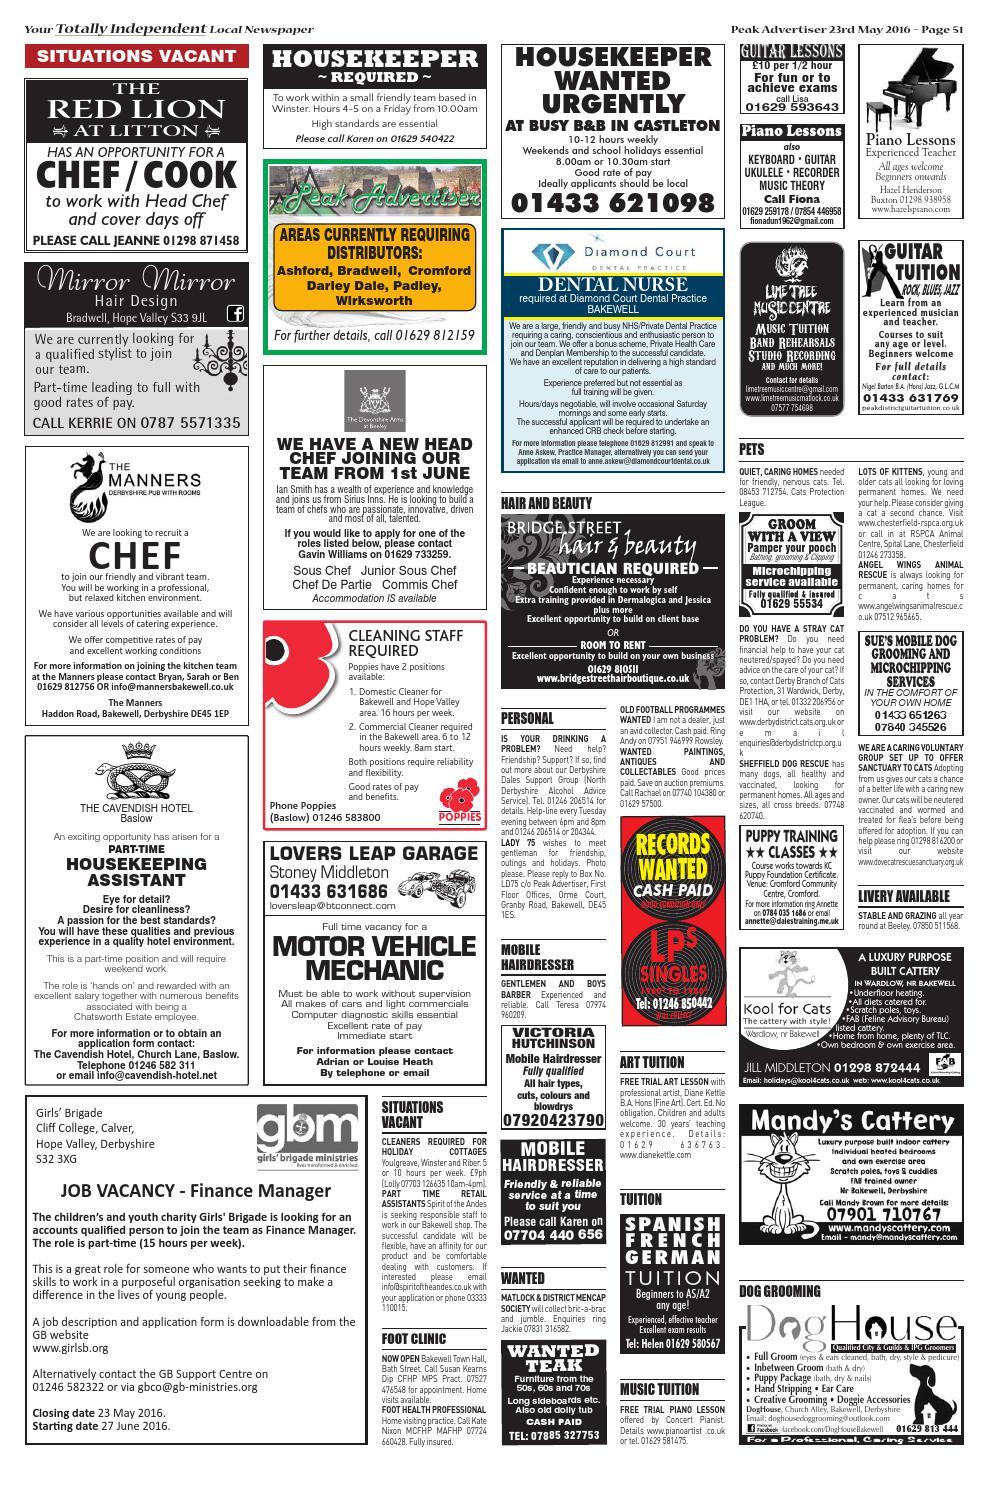 The Peak Advertiser 23 5 16 by Peak Advertiser - issuu